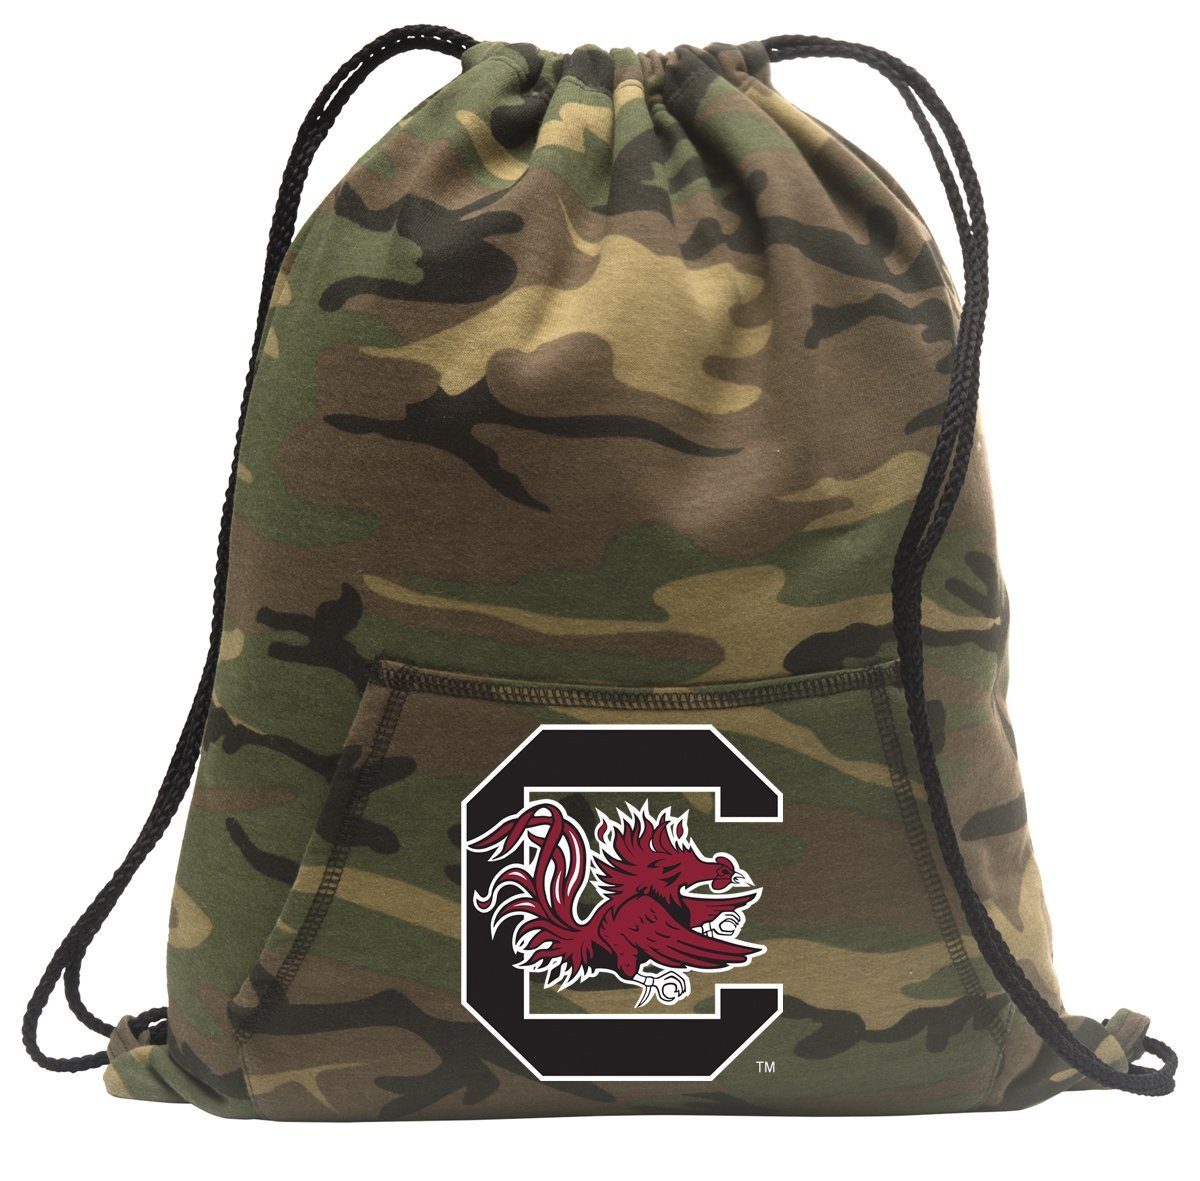 Camo South Carolina Gamecocks Drawstring Bag COOL Hoody University of South Carolina Cinch Pack